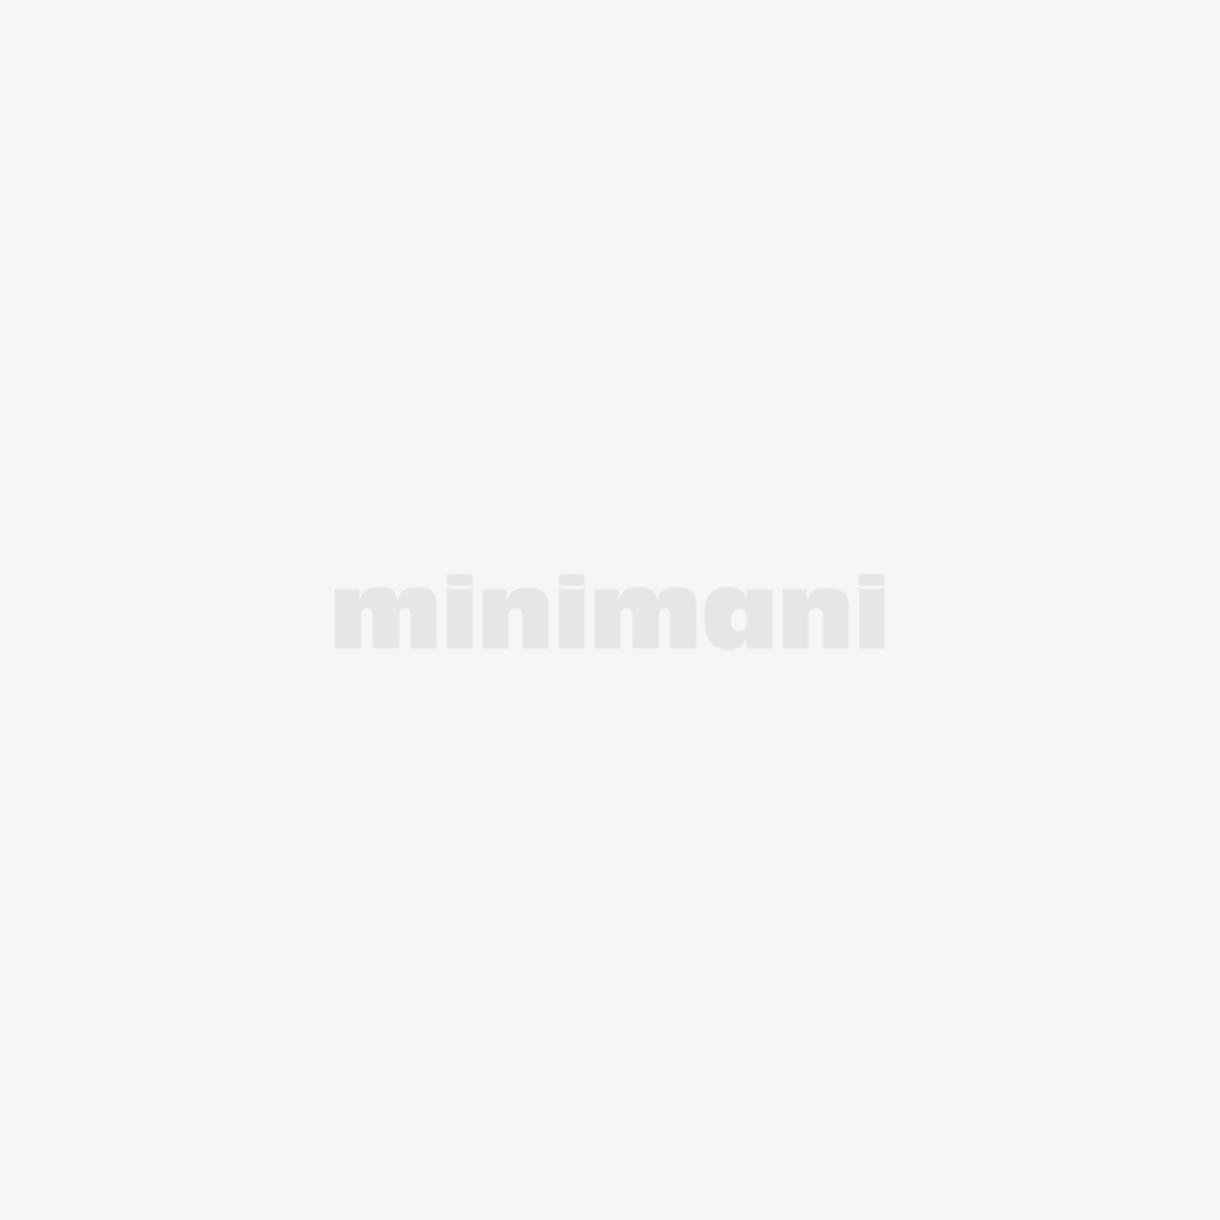 FINNMARI JUOMA-ASTIA HANALLA 3,8